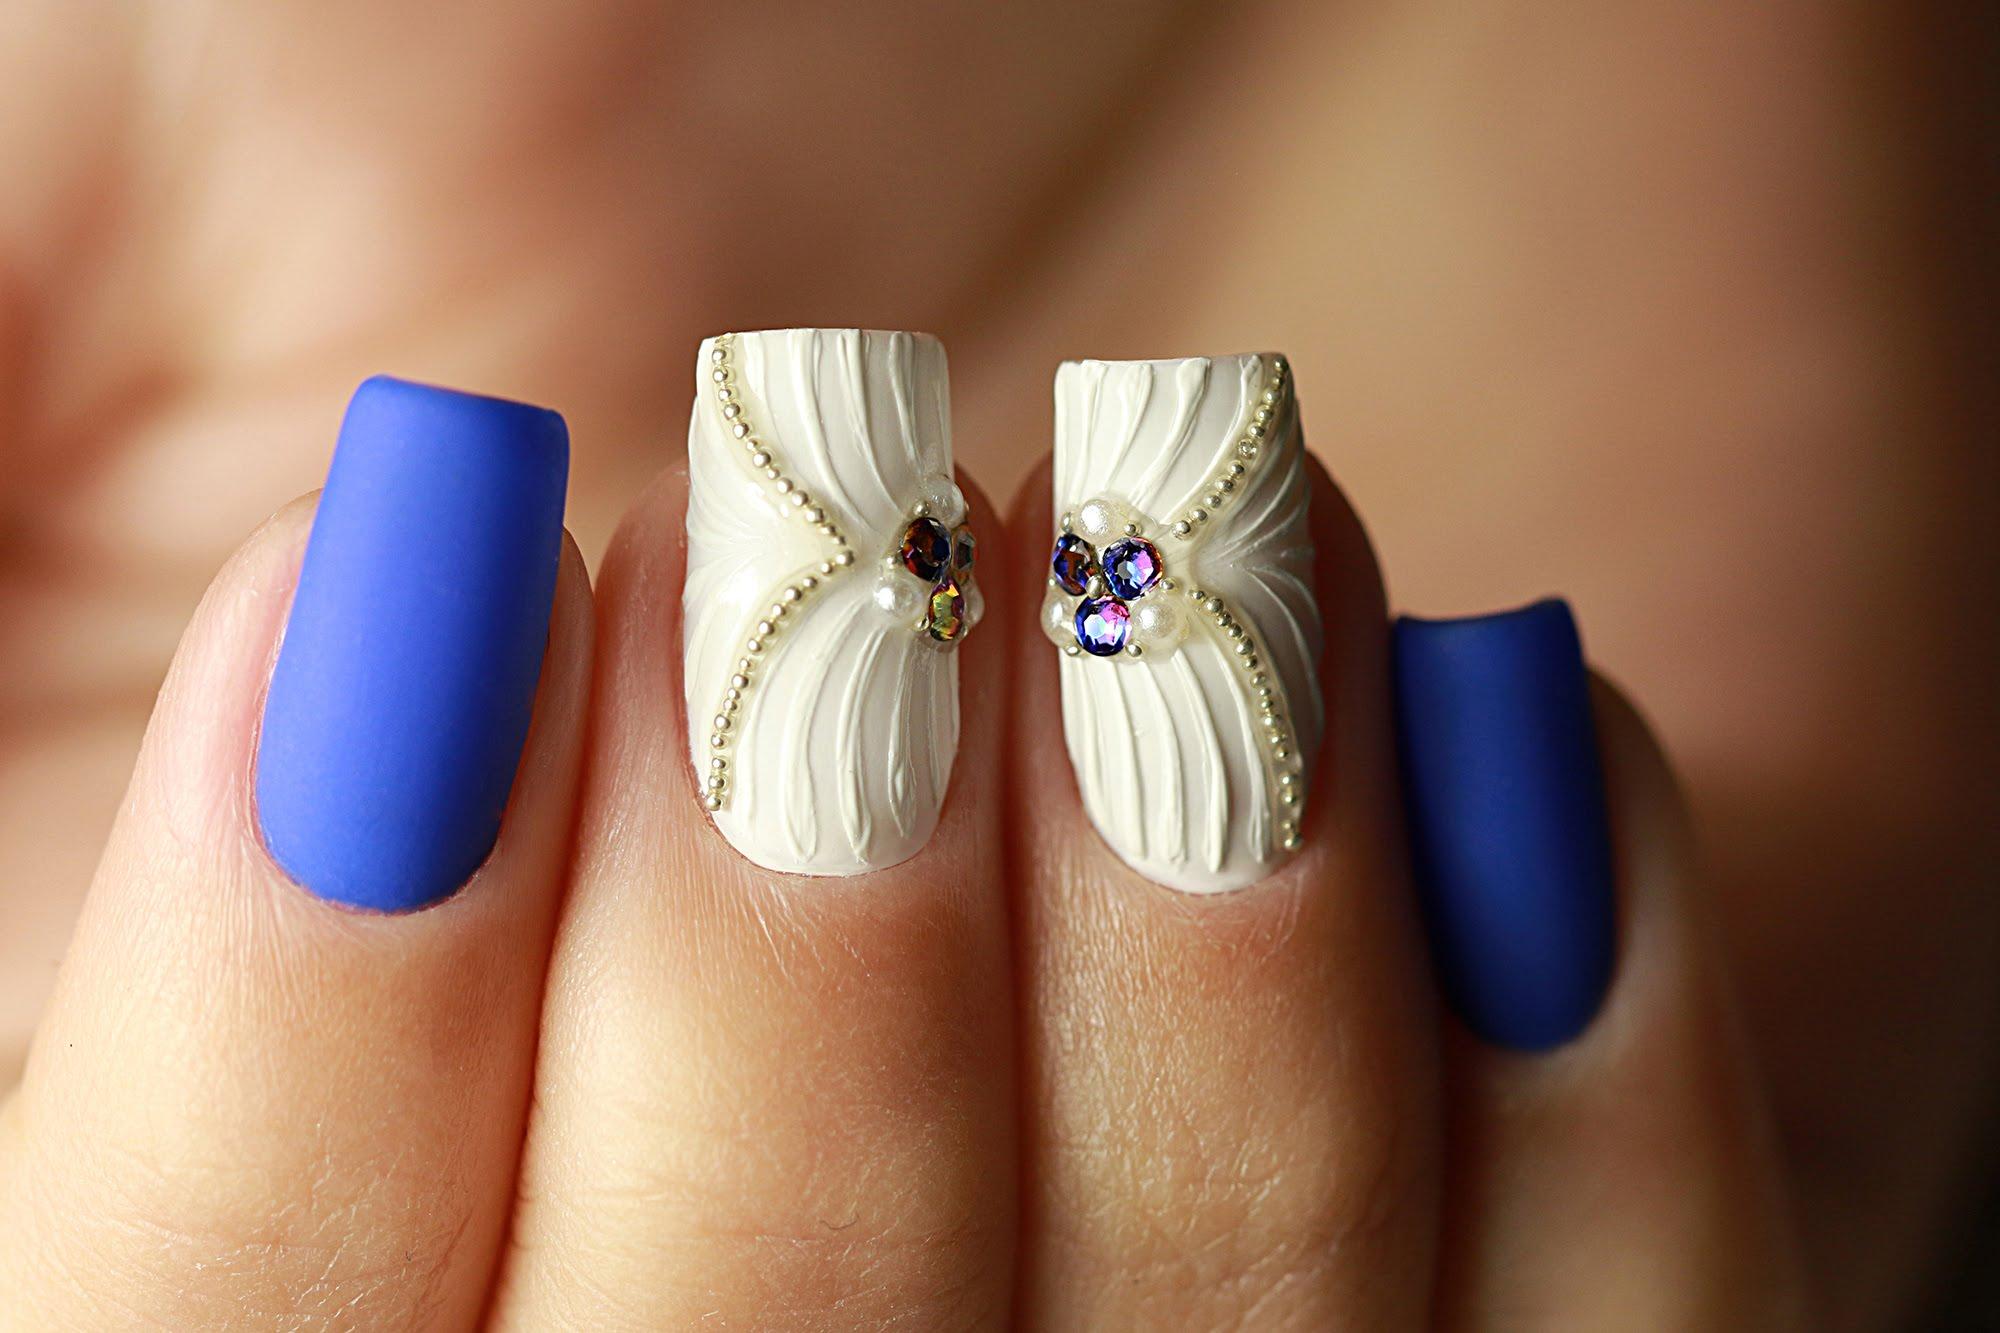 Дизайн «Ракушки» на ногтях гель-лаком 86